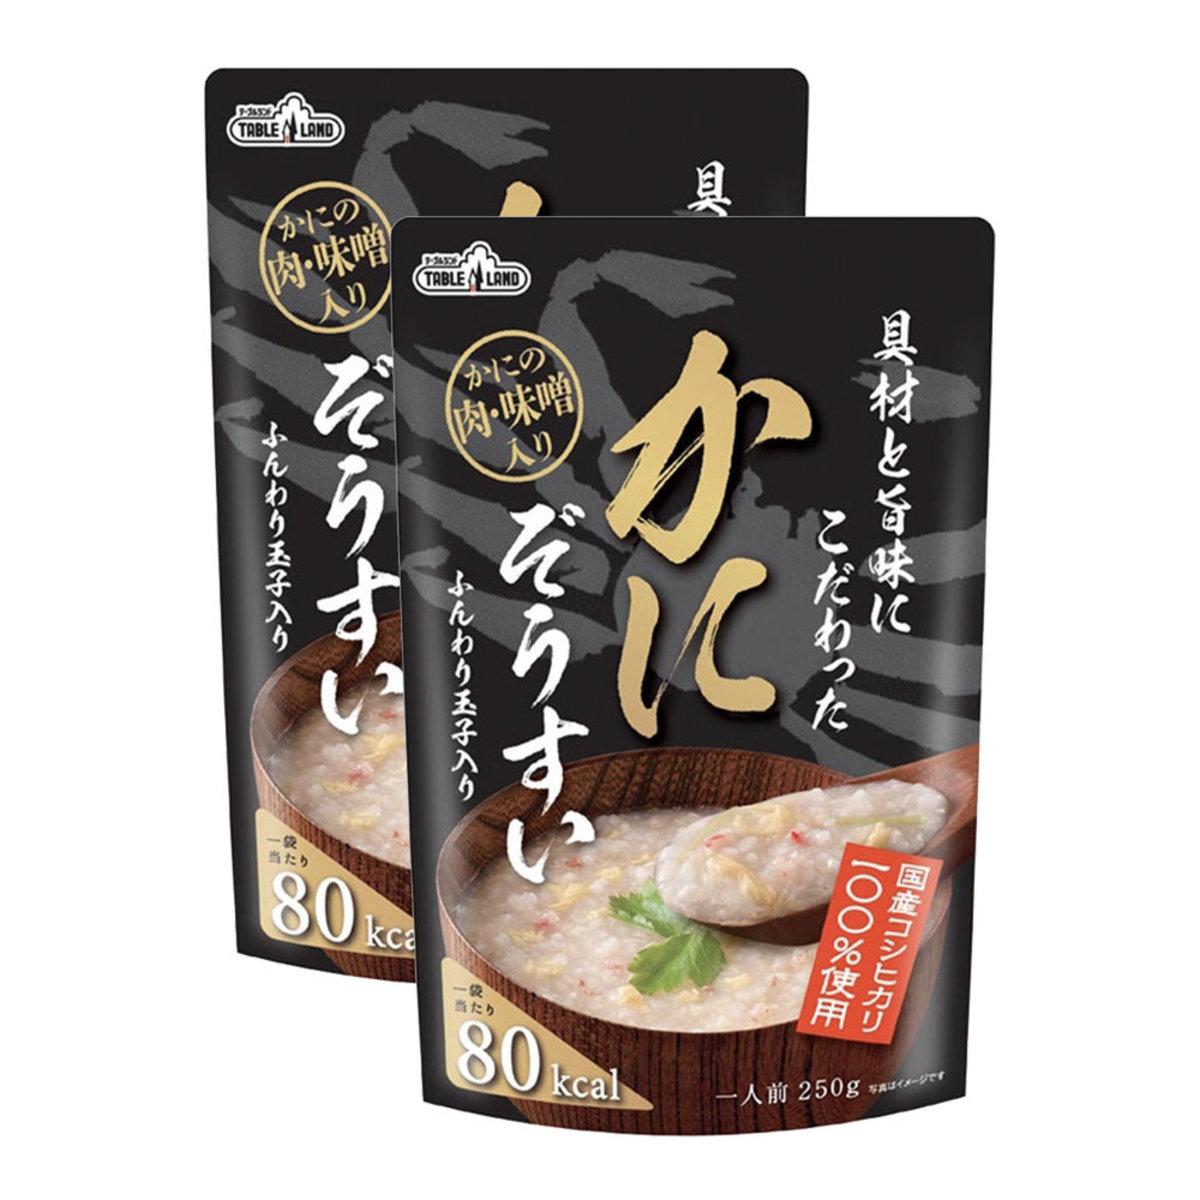 Koshihikari Rice Porridge 250g - Egg Crabmeat ×2(Red)